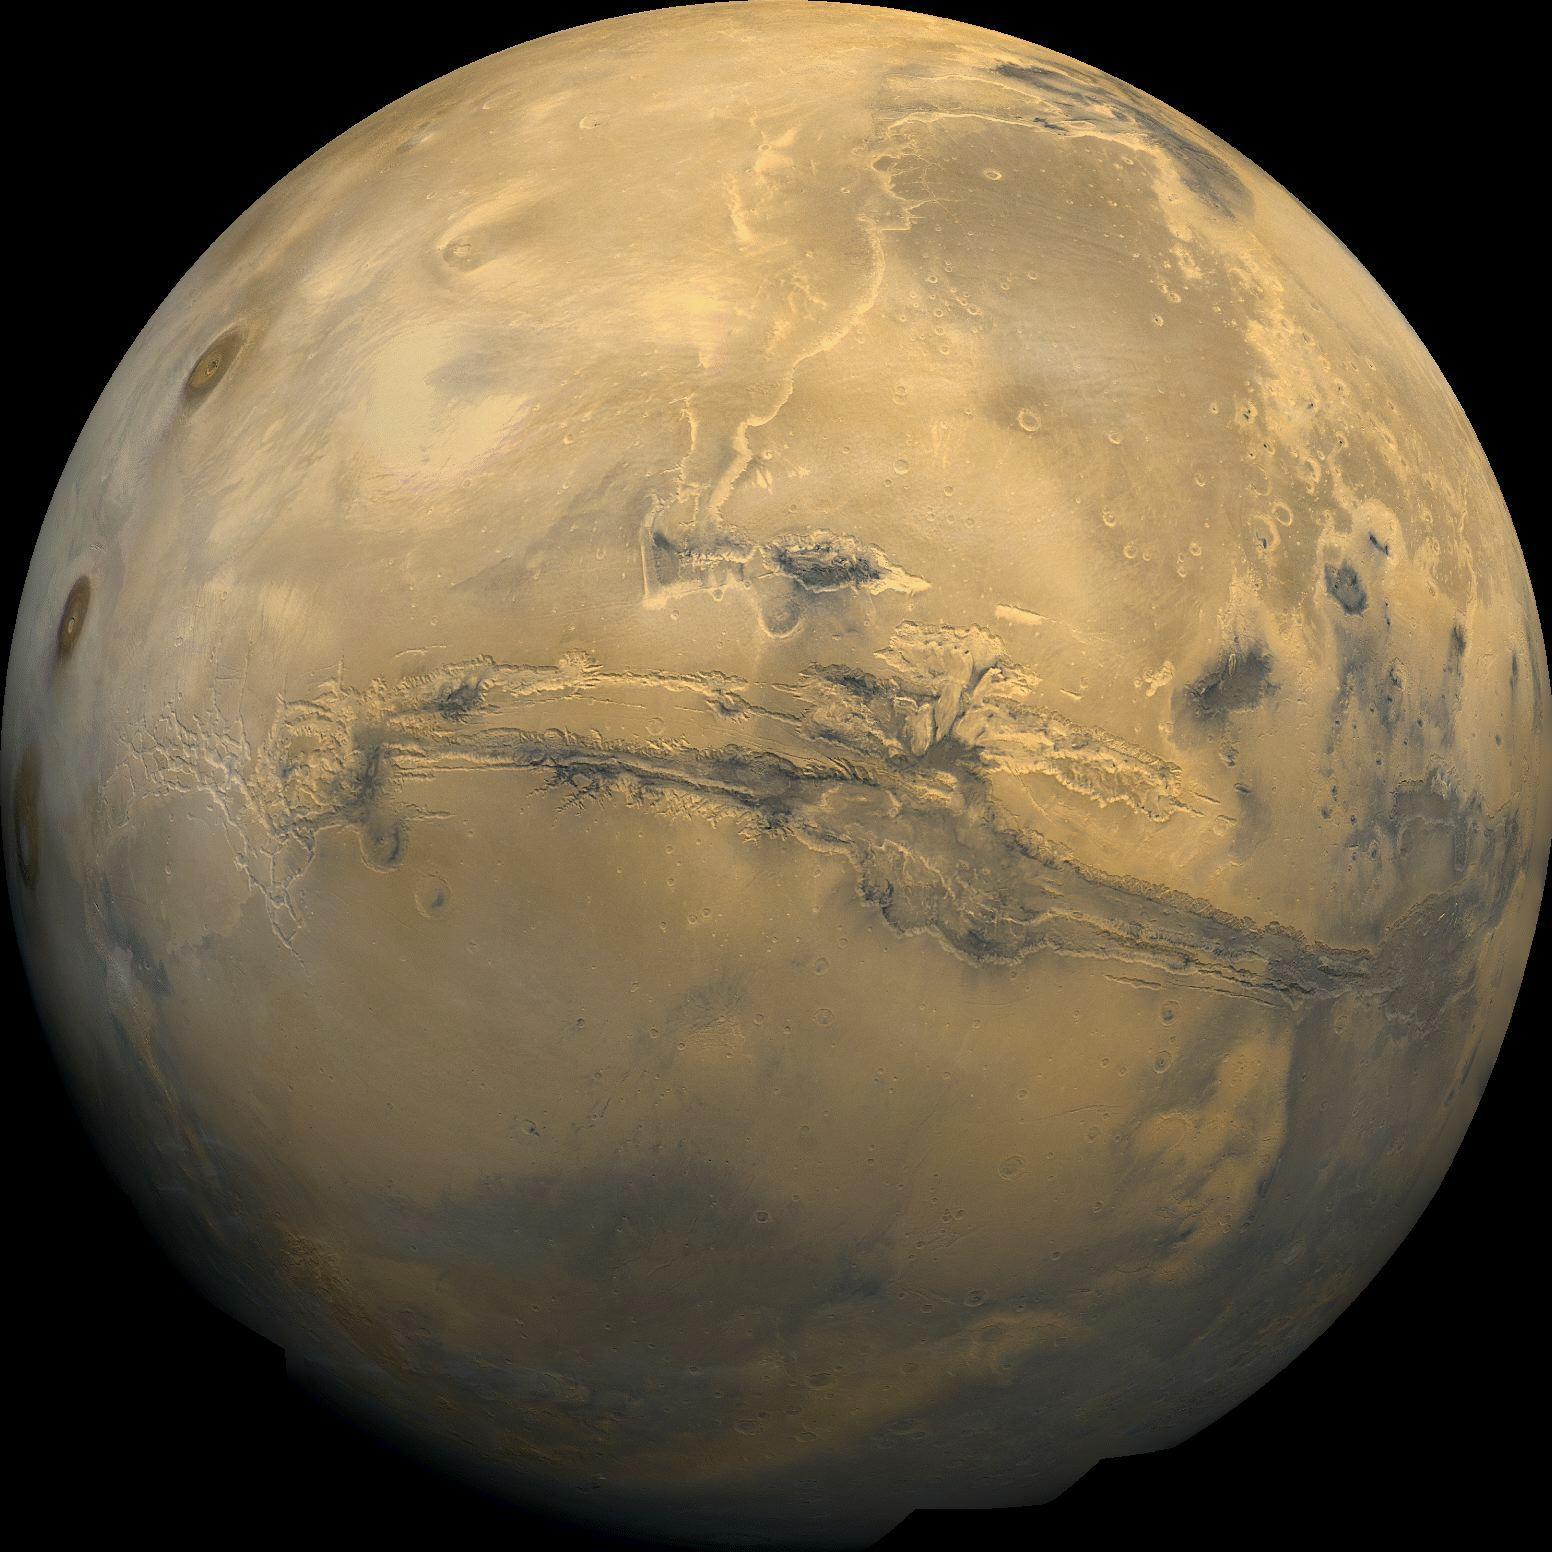 Mars_valles_marineris